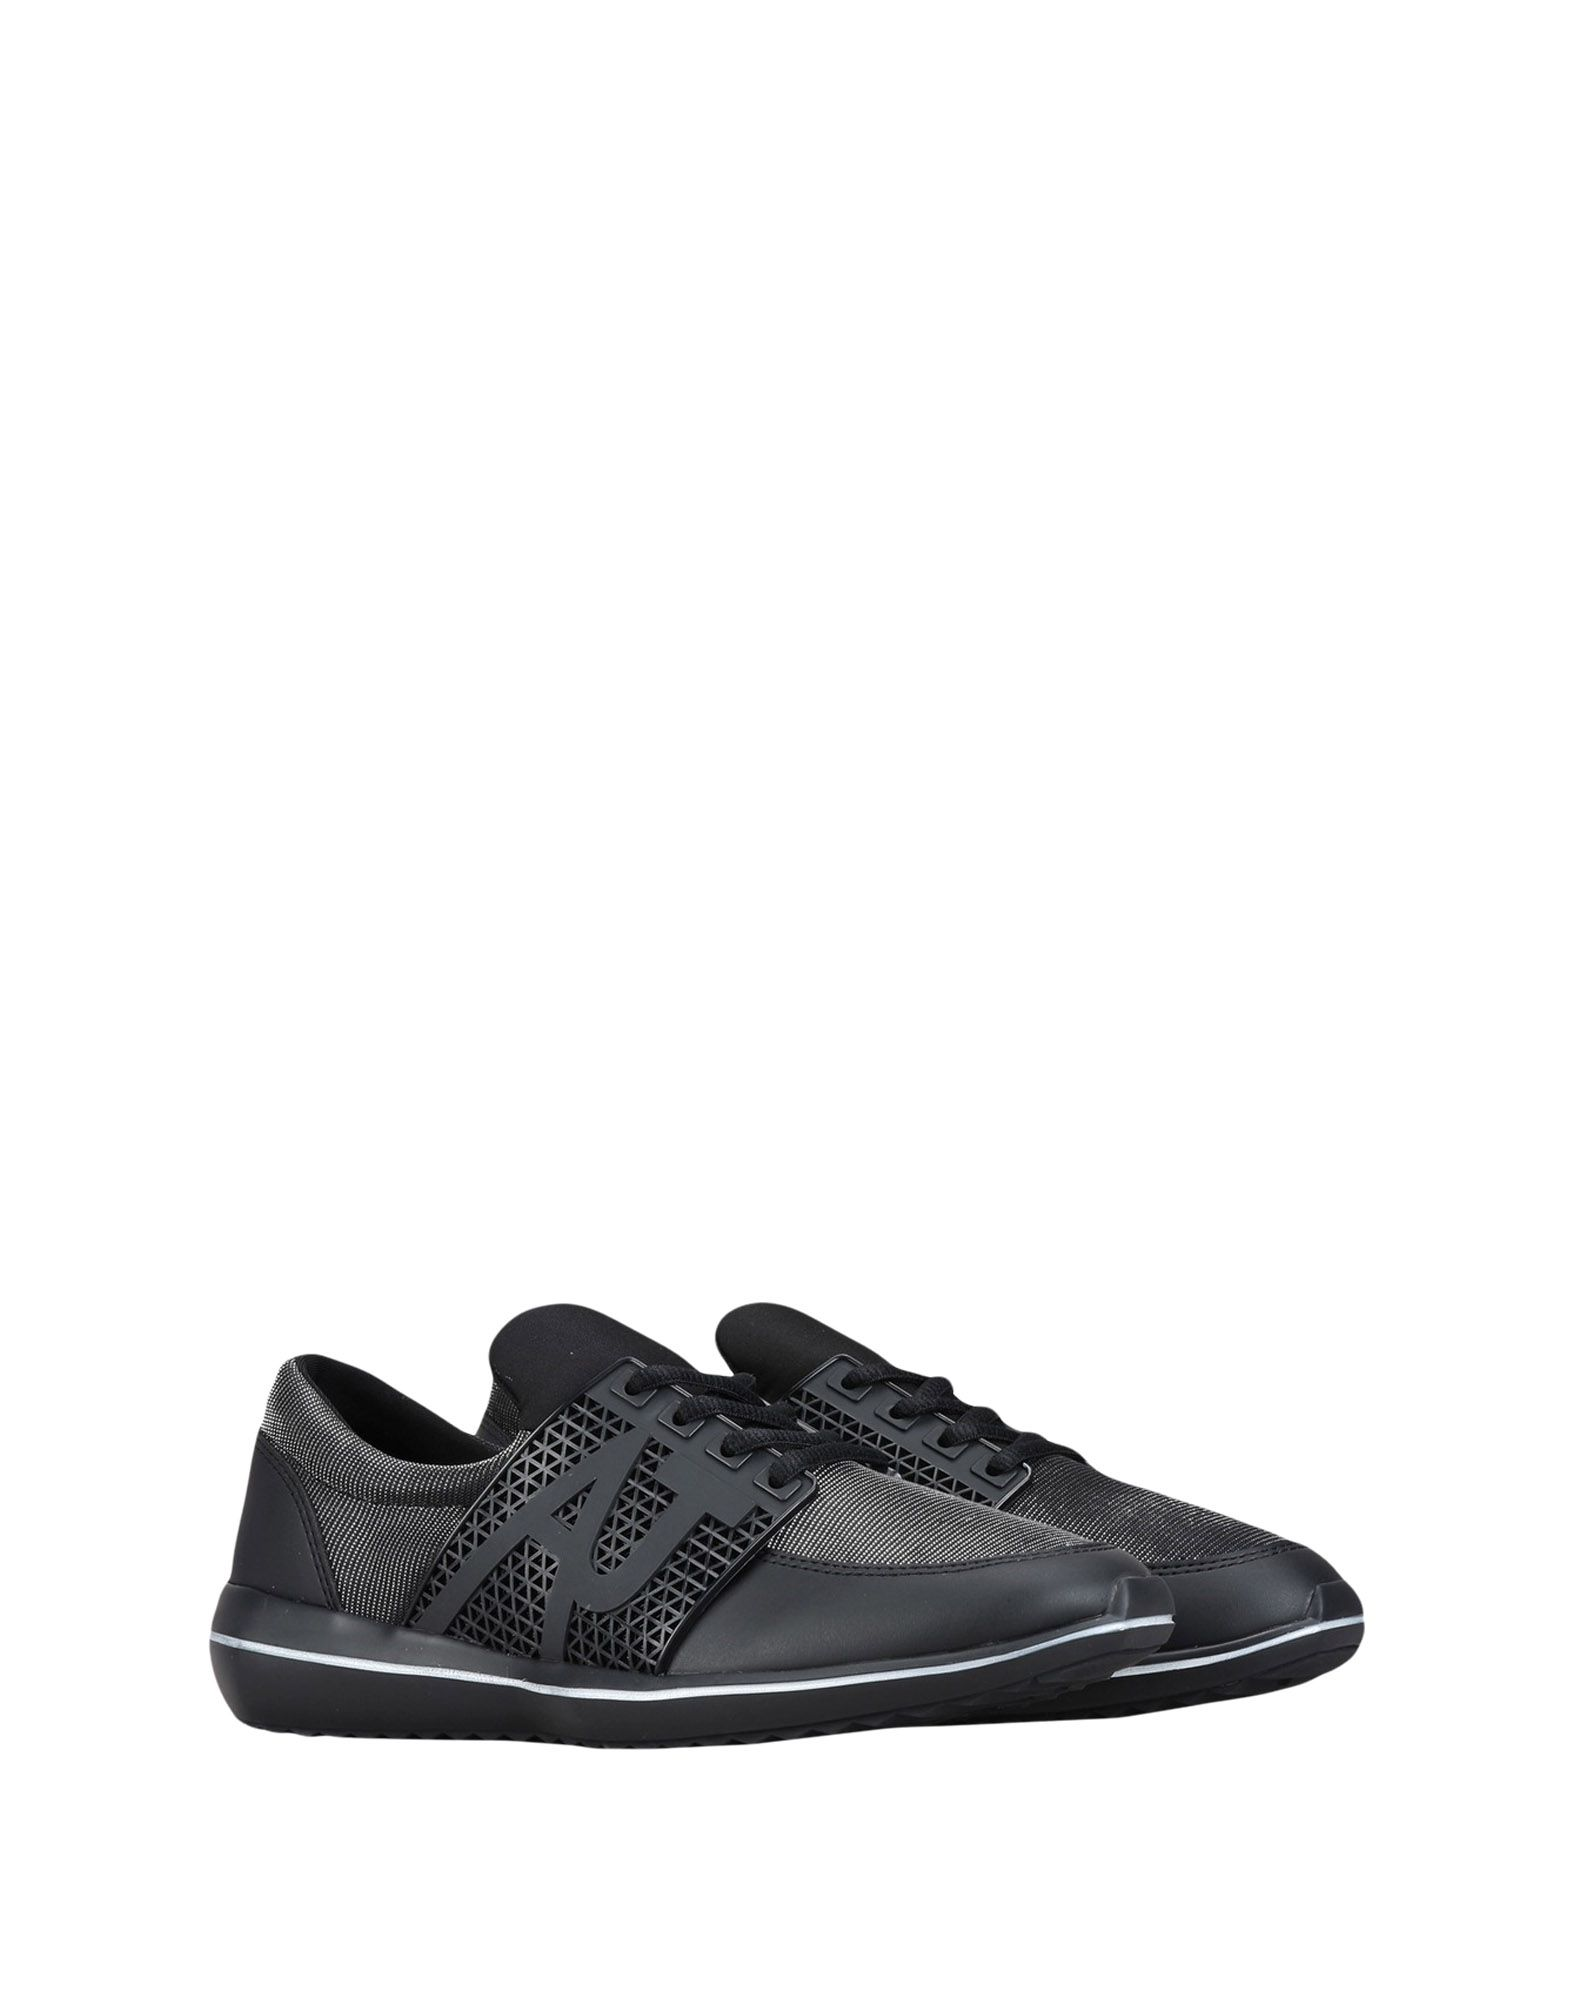 Armani Jeans Sneakers - Women Armani Jeans Sneakers online - on  United Kingdom - online 11560150UR 3120ee